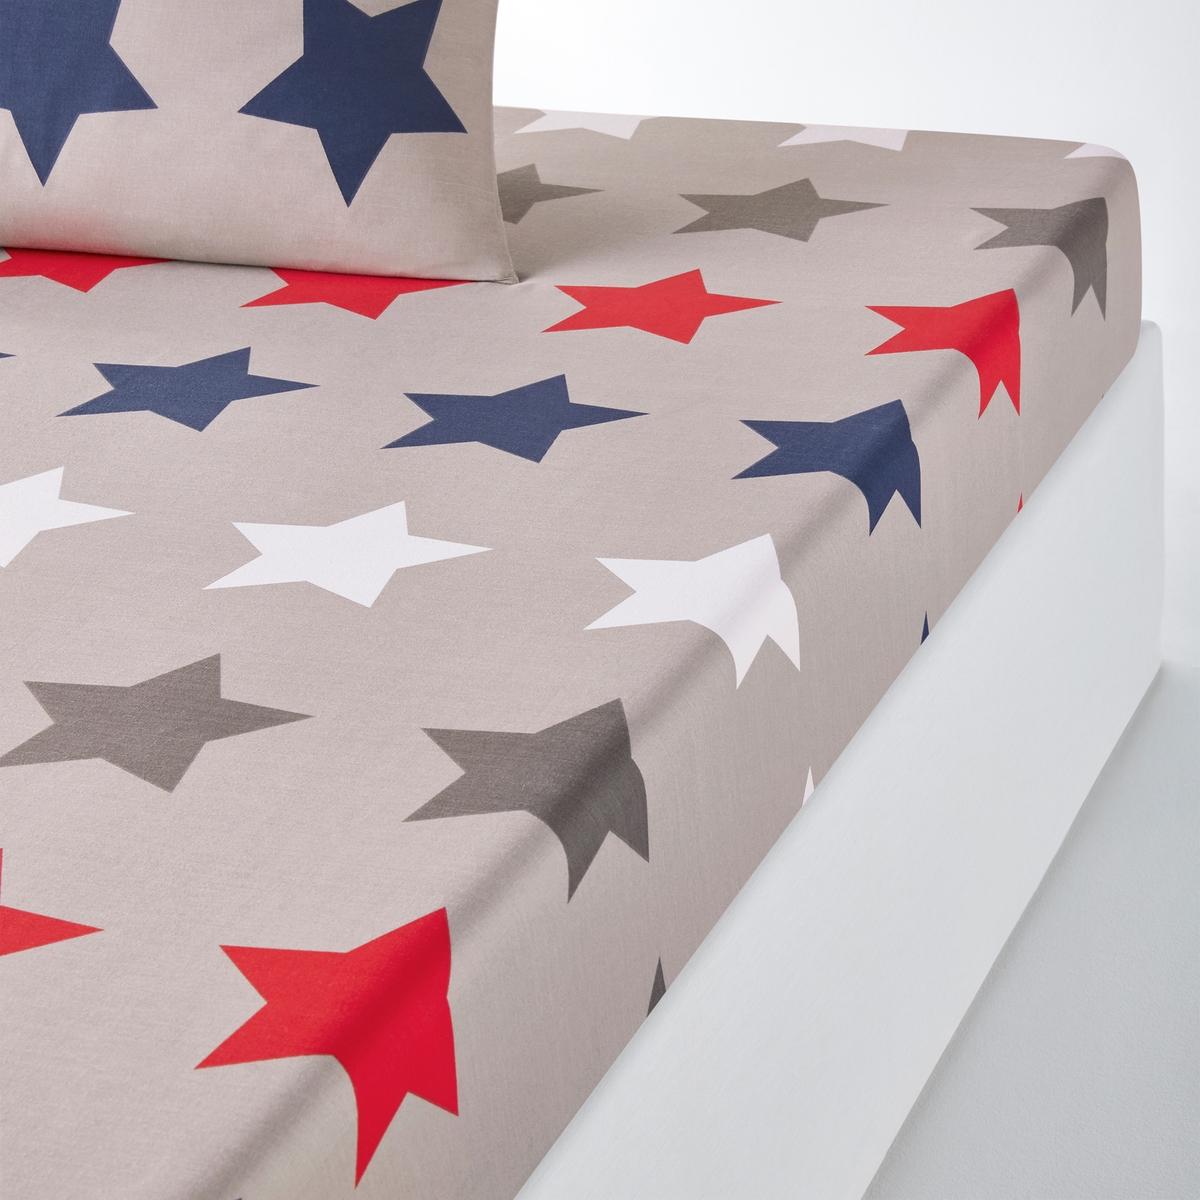 Натяжная простыня La Redoute STARS 160 x 200 см серый простыня la redoute натяжная из перкали grues 90 x 190 см синий